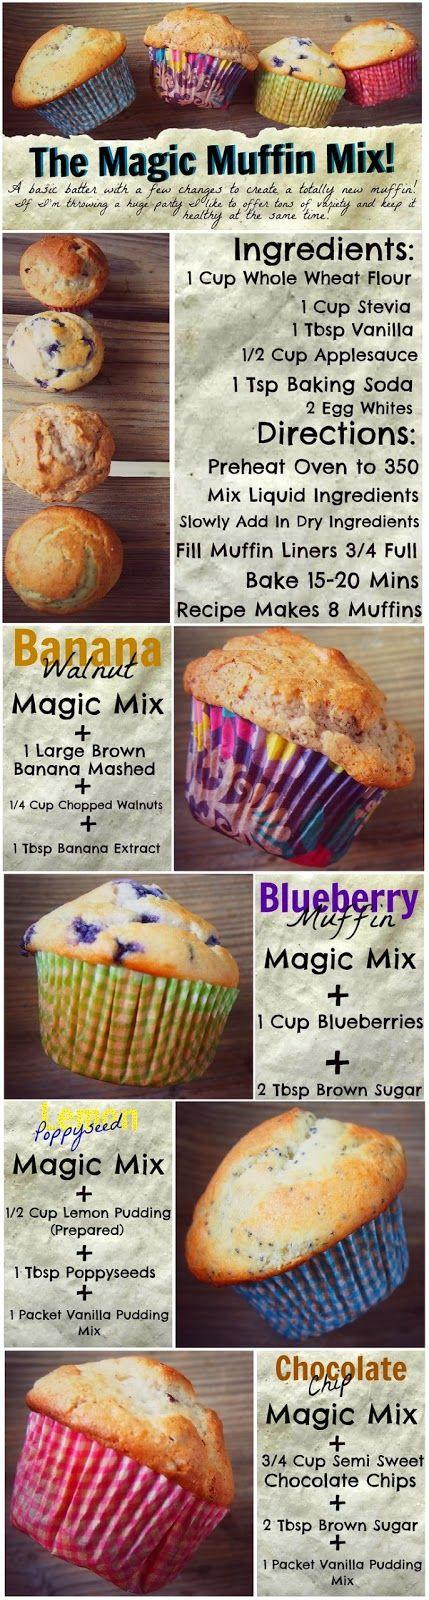 CHERYL's Cooking!!: Magic Muffin Mix